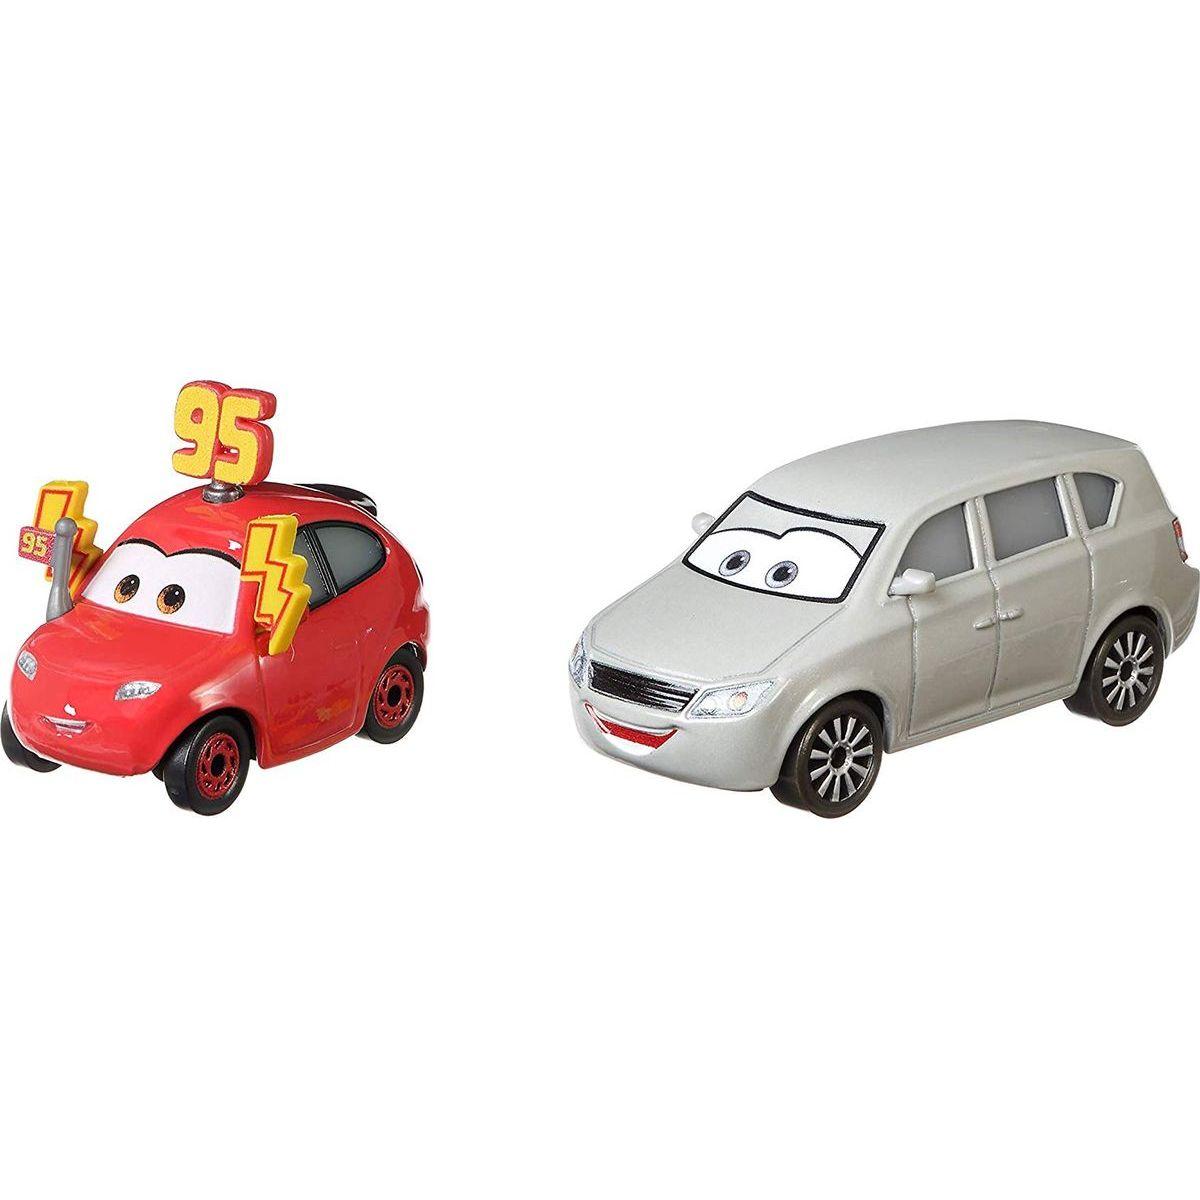 Mattel Cars 3 auta 2 ks Maddy McGear a Melissa Bernabrake